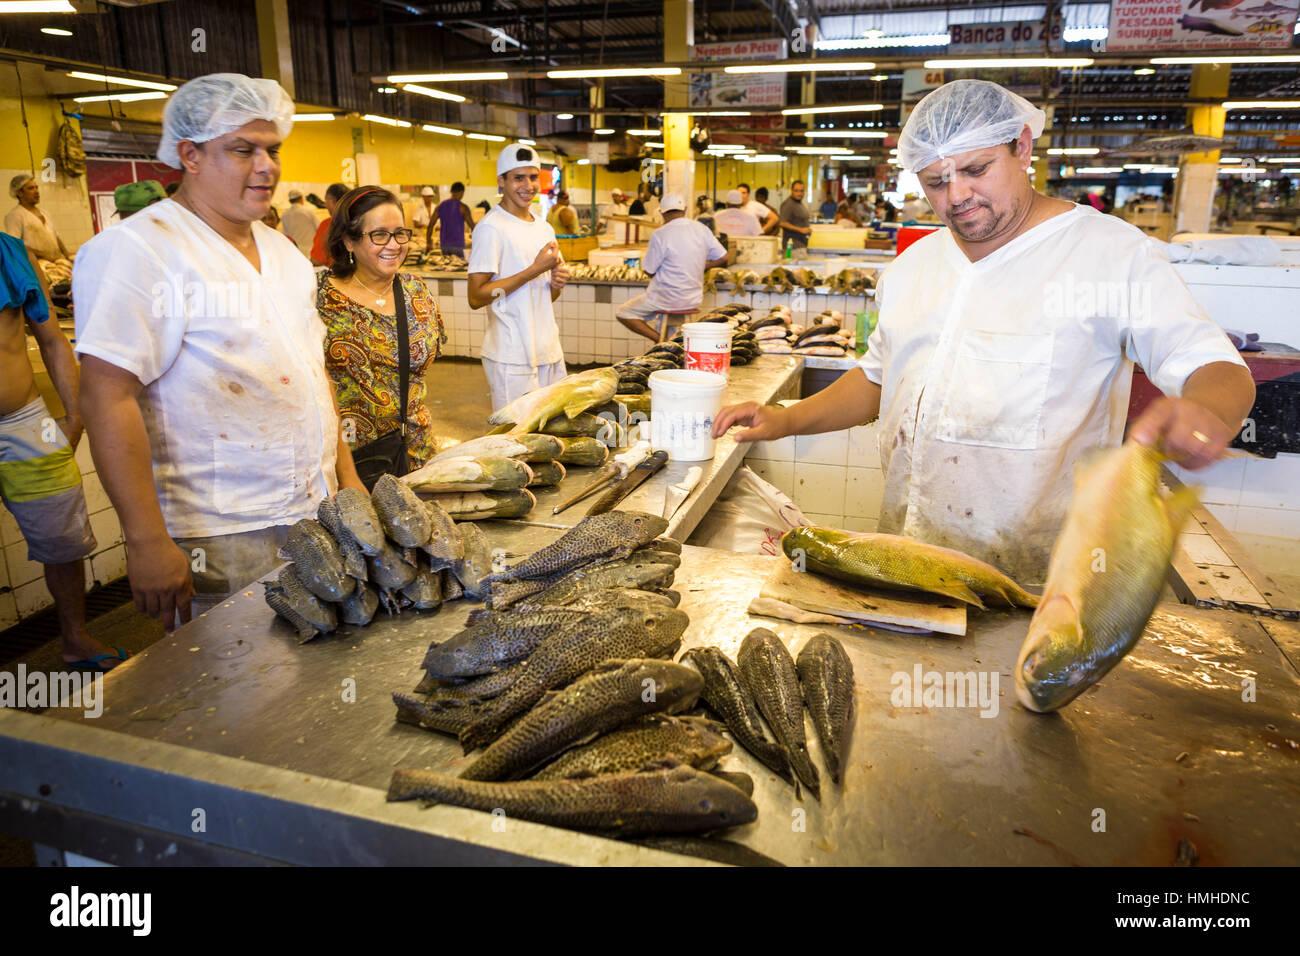 Amazon river fish in market stock photos amazon river for River fish market